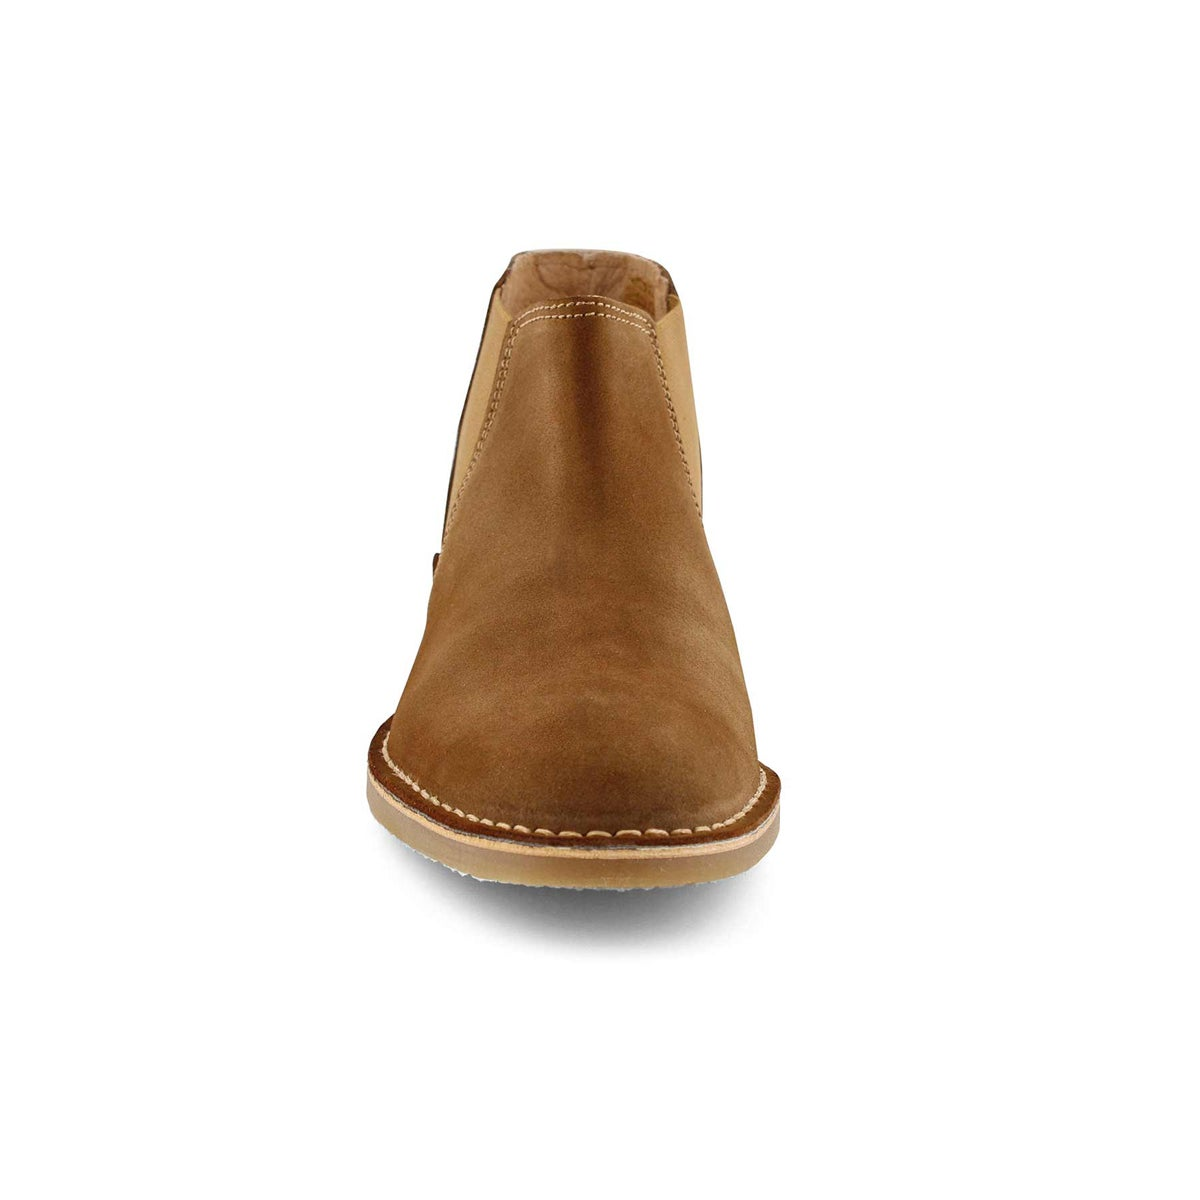 d7b1354ebae Men | Casual Boots | SoftMoc.com bard